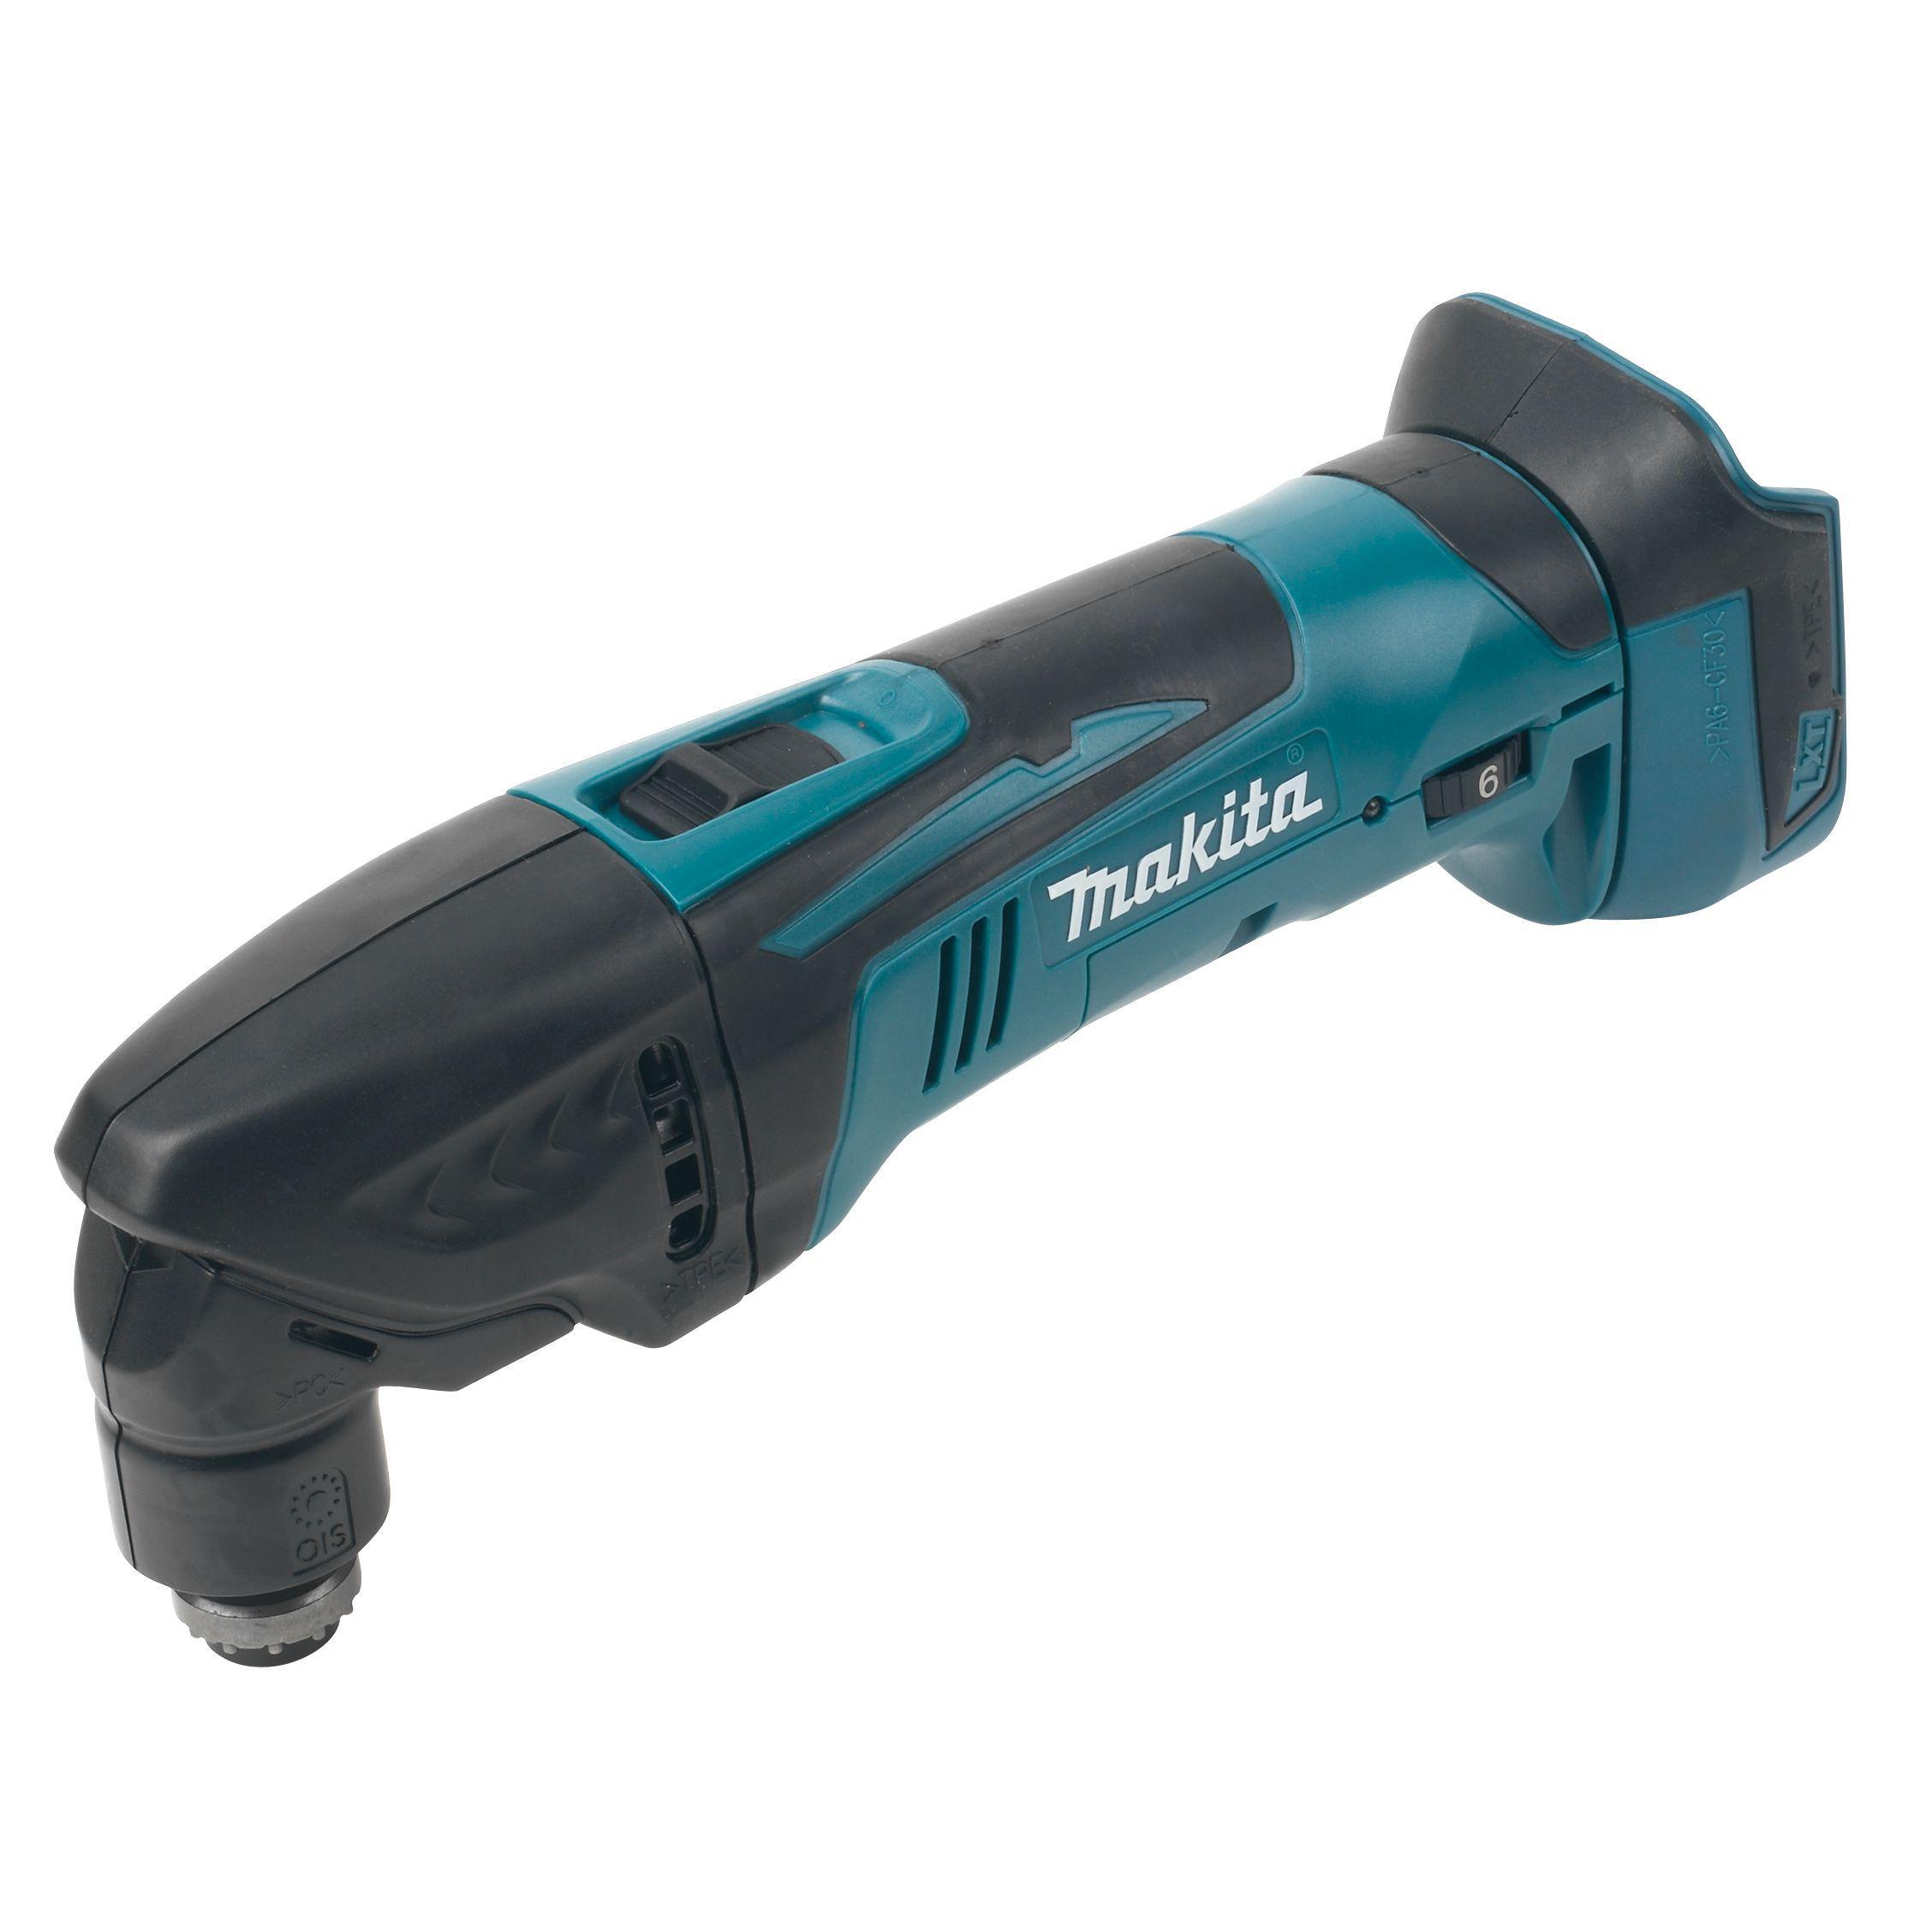 makita cordless grinder. makita lxt 18v cordless multi tool dtm50z - bare | tools \u0026 hobby diy at b\u0026q grinder